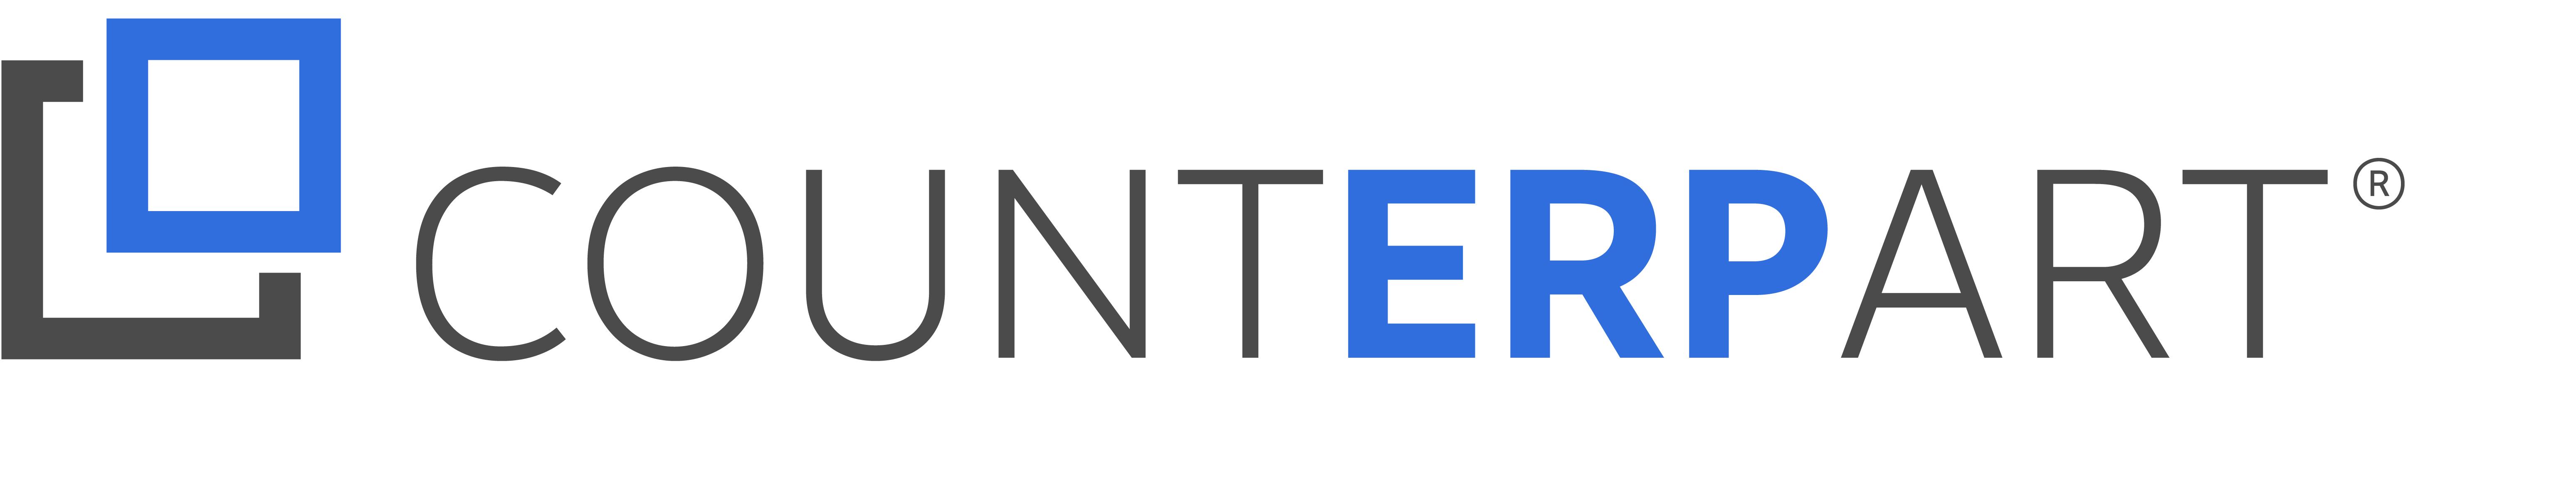 COUNTERPART ETO ERP Engineering Efficiency Focus on Industrial Talk Podcast